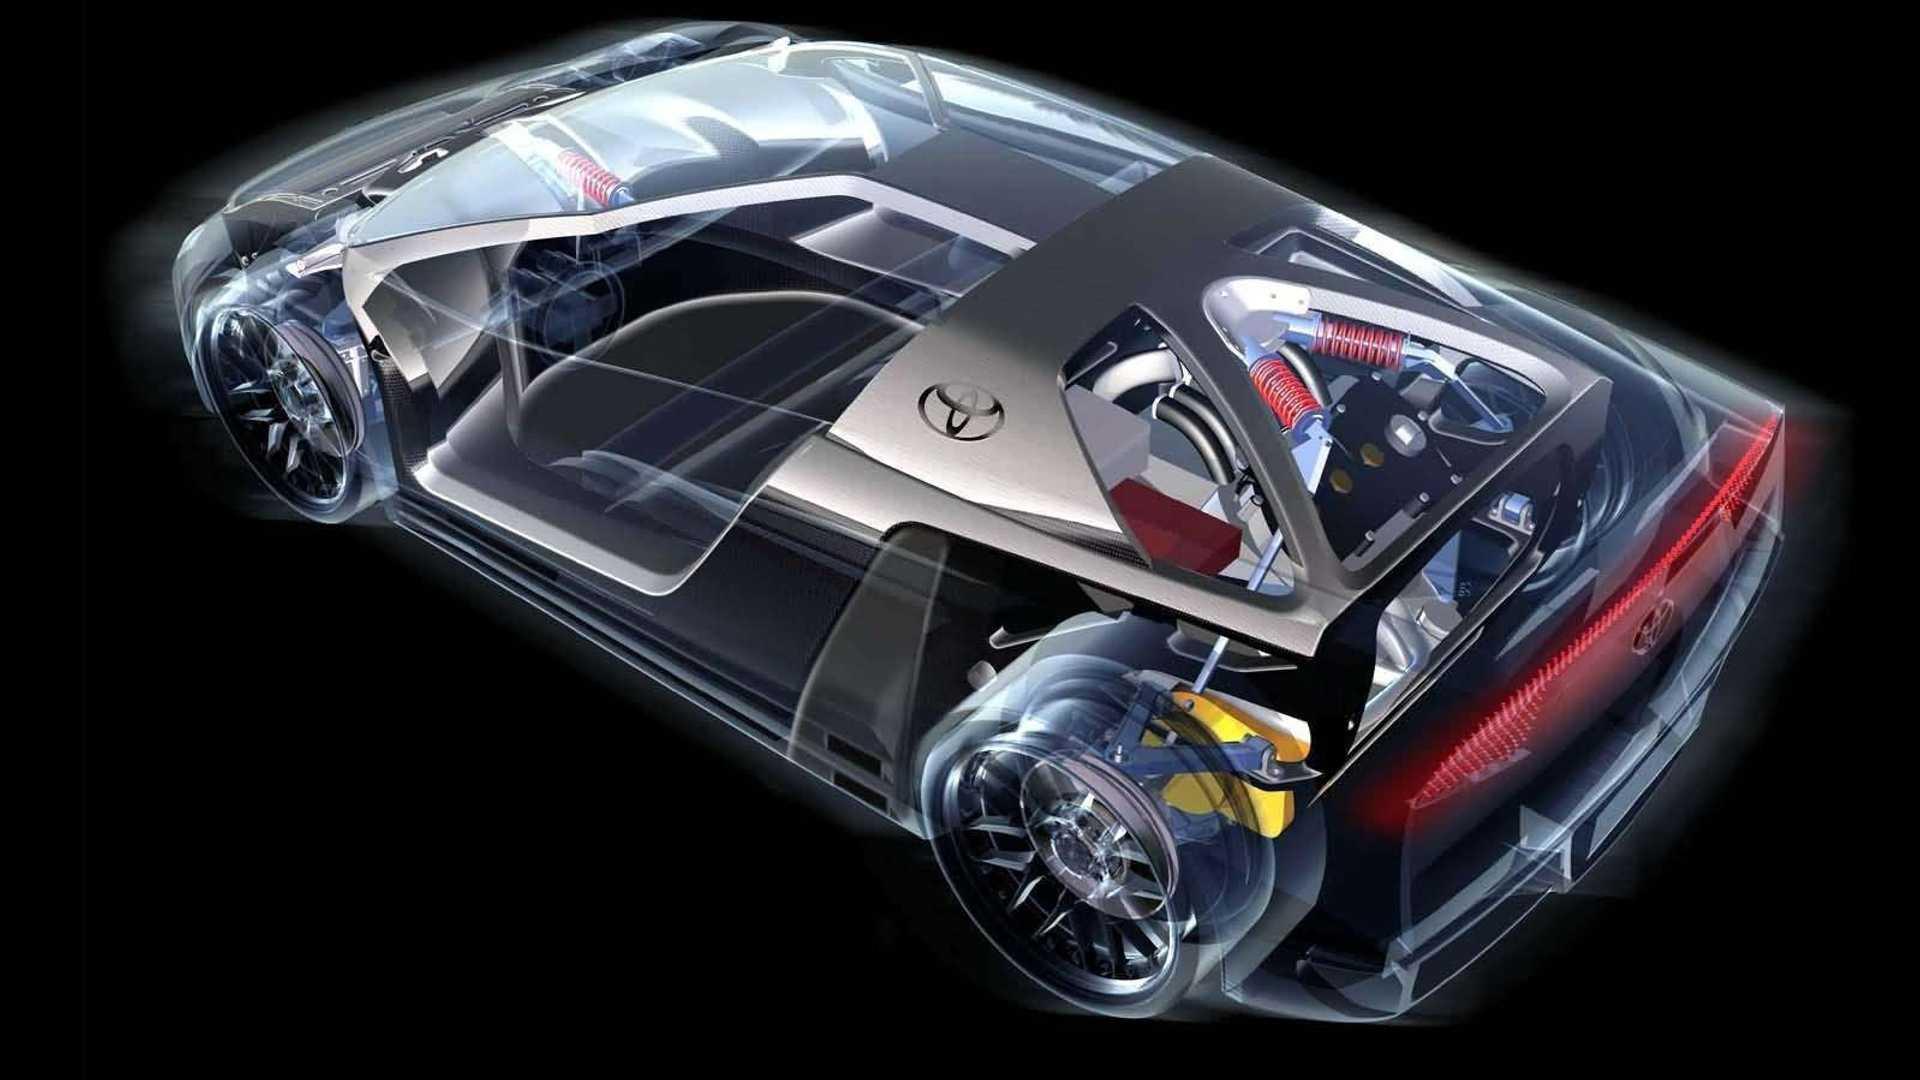 Toyota-Alessandro-Volta-concept-2004-28